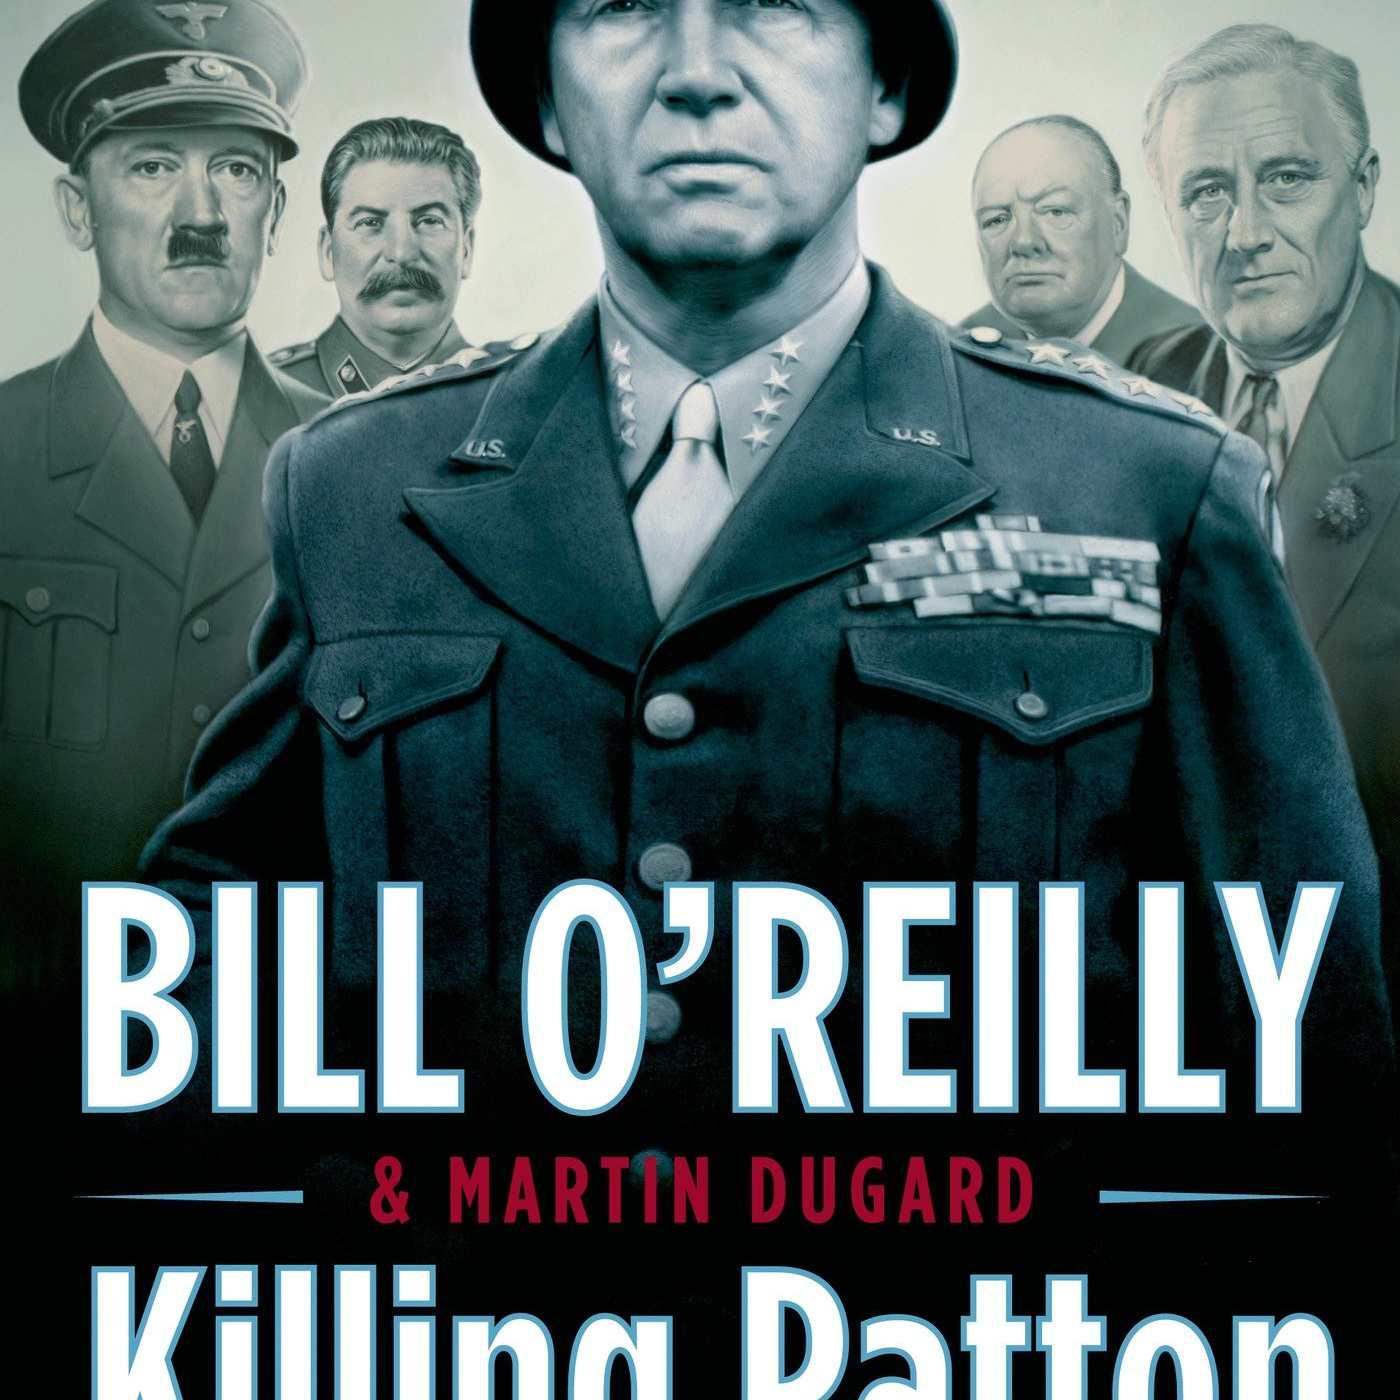 Killing Patton, by Bill O'Reilly